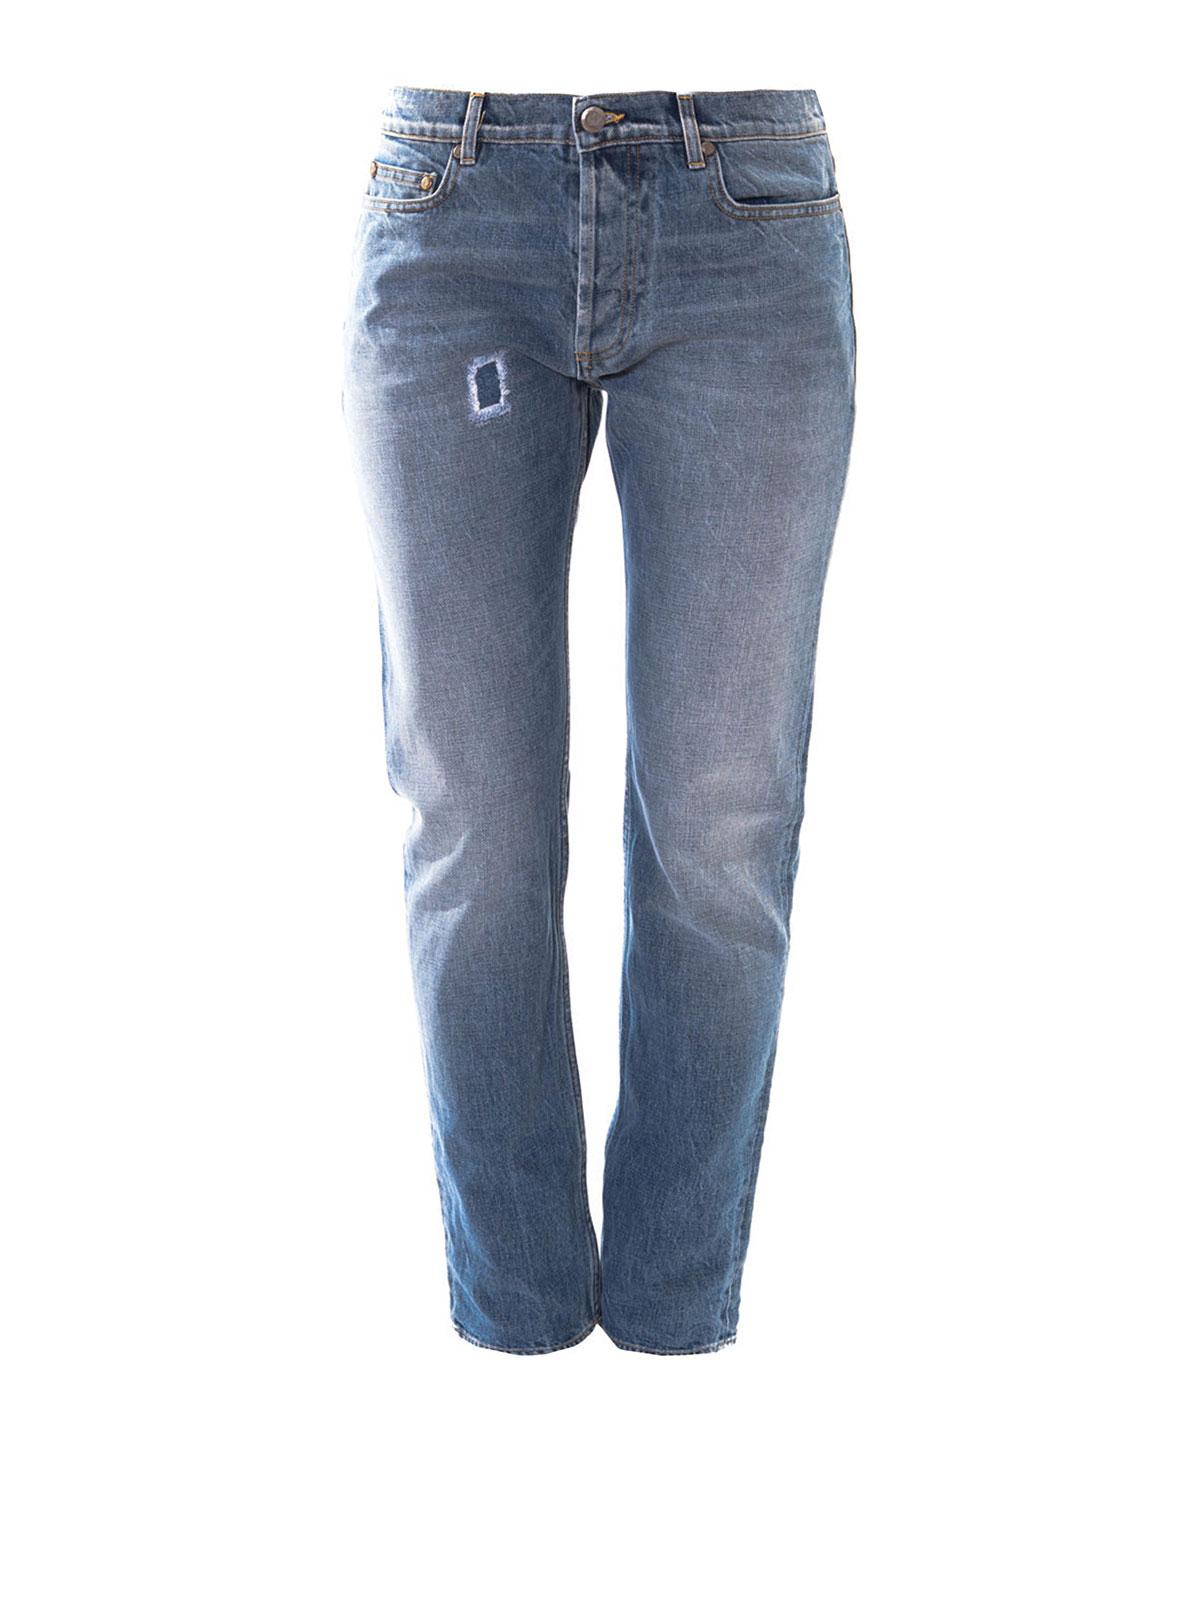 five pockets baggy jeans by golden goose straight leg jeans ikrix. Black Bedroom Furniture Sets. Home Design Ideas